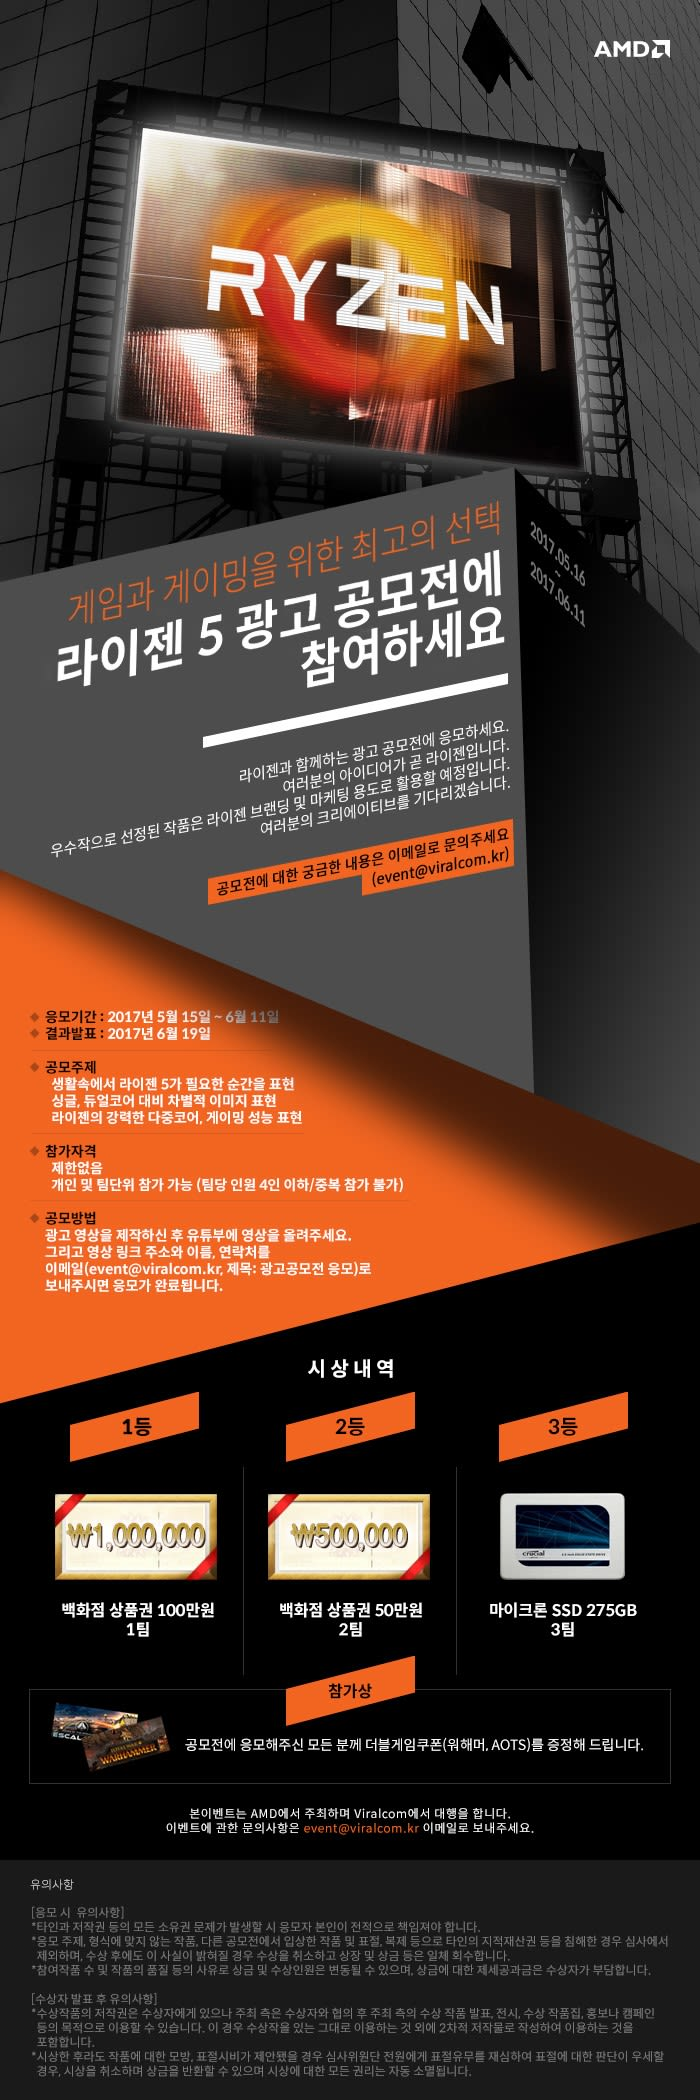 AMD 라이젠 5 광고 공모전 모집